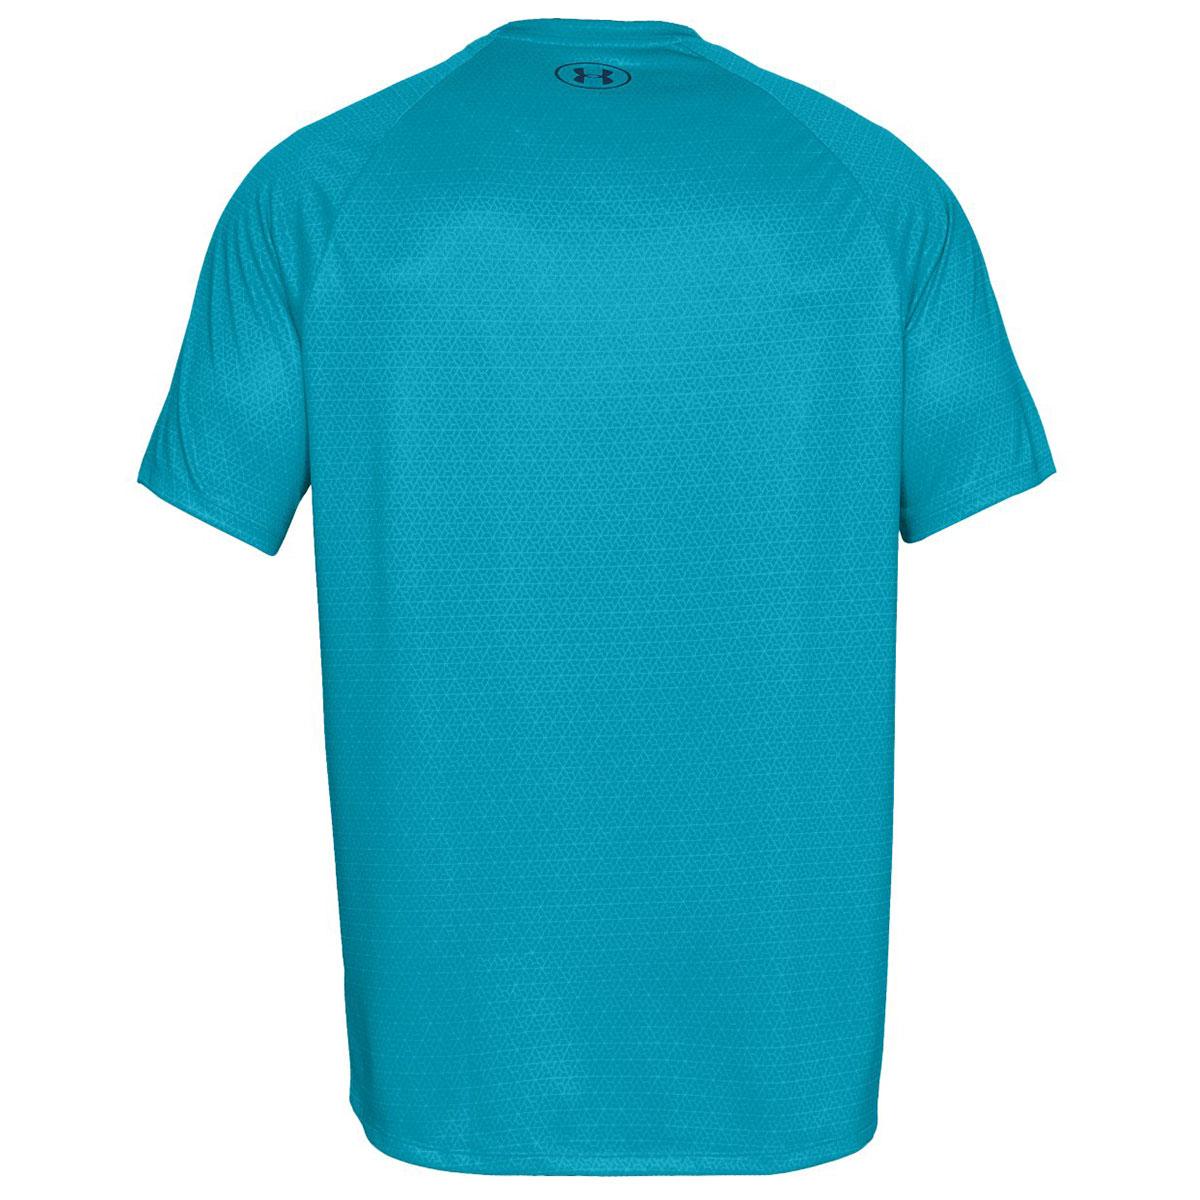 Under-Armour-Mens-UA-Tech-SS-Printed-Moisture-Wicking-T-Shirt-Tee-27-OFF-RRP thumbnail 13